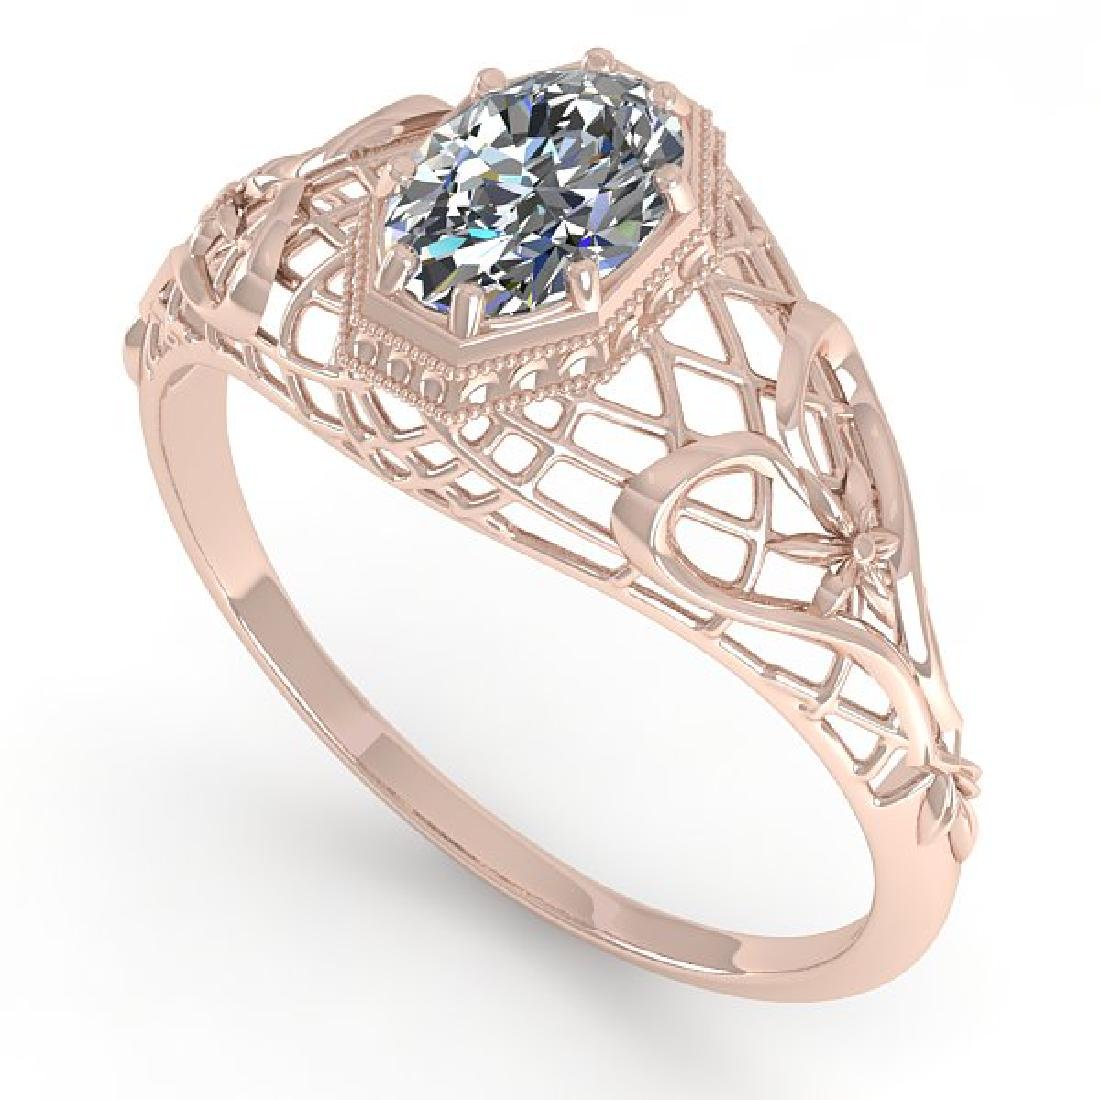 0.50 CTW VS/SI Oval Diamond Solitaire Ring Art Deco 14K - 2